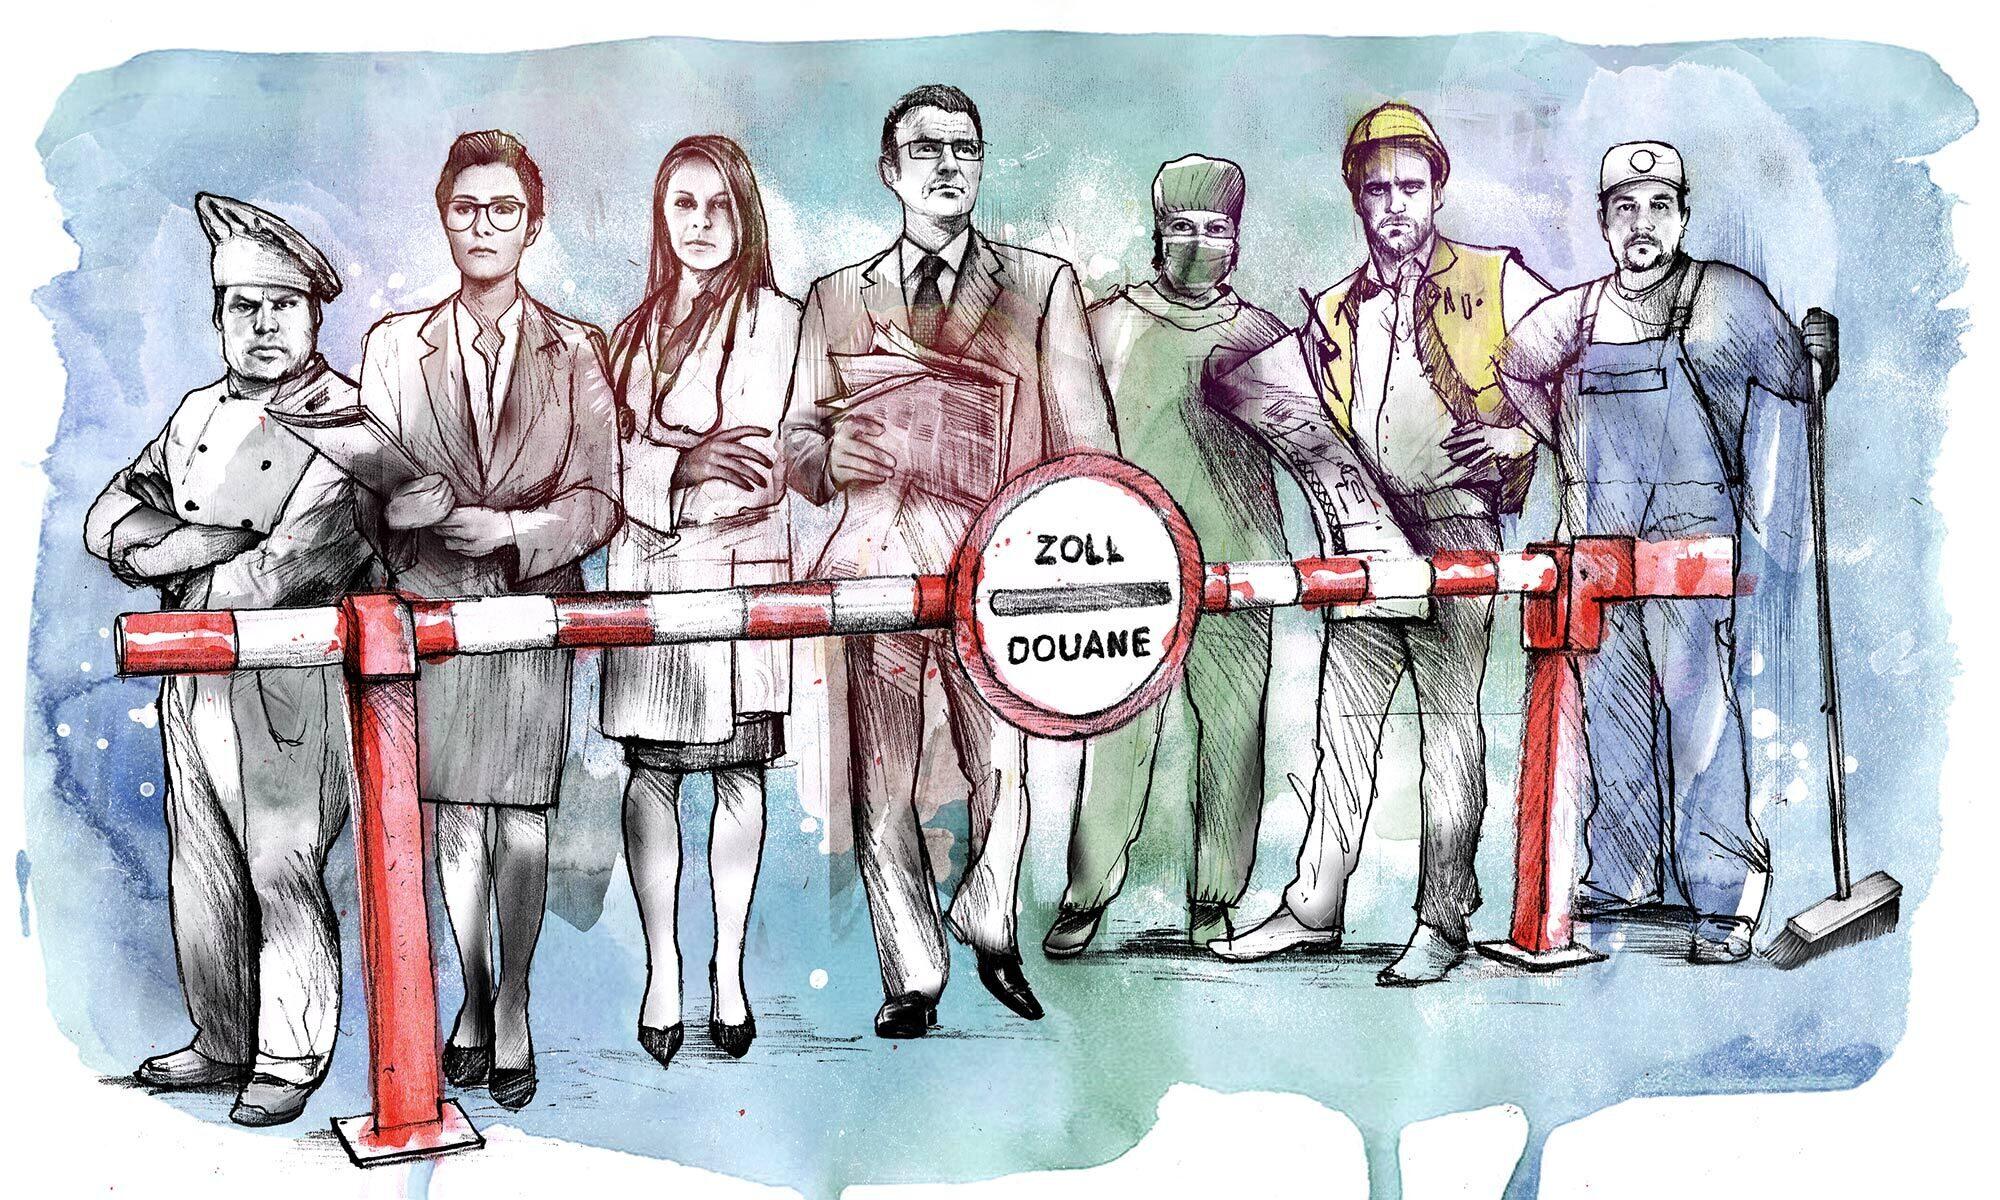 Wirtschaftsprognose Zoll Berufe Illustration - Kornel Illustration   Kornel Stadler portfolio